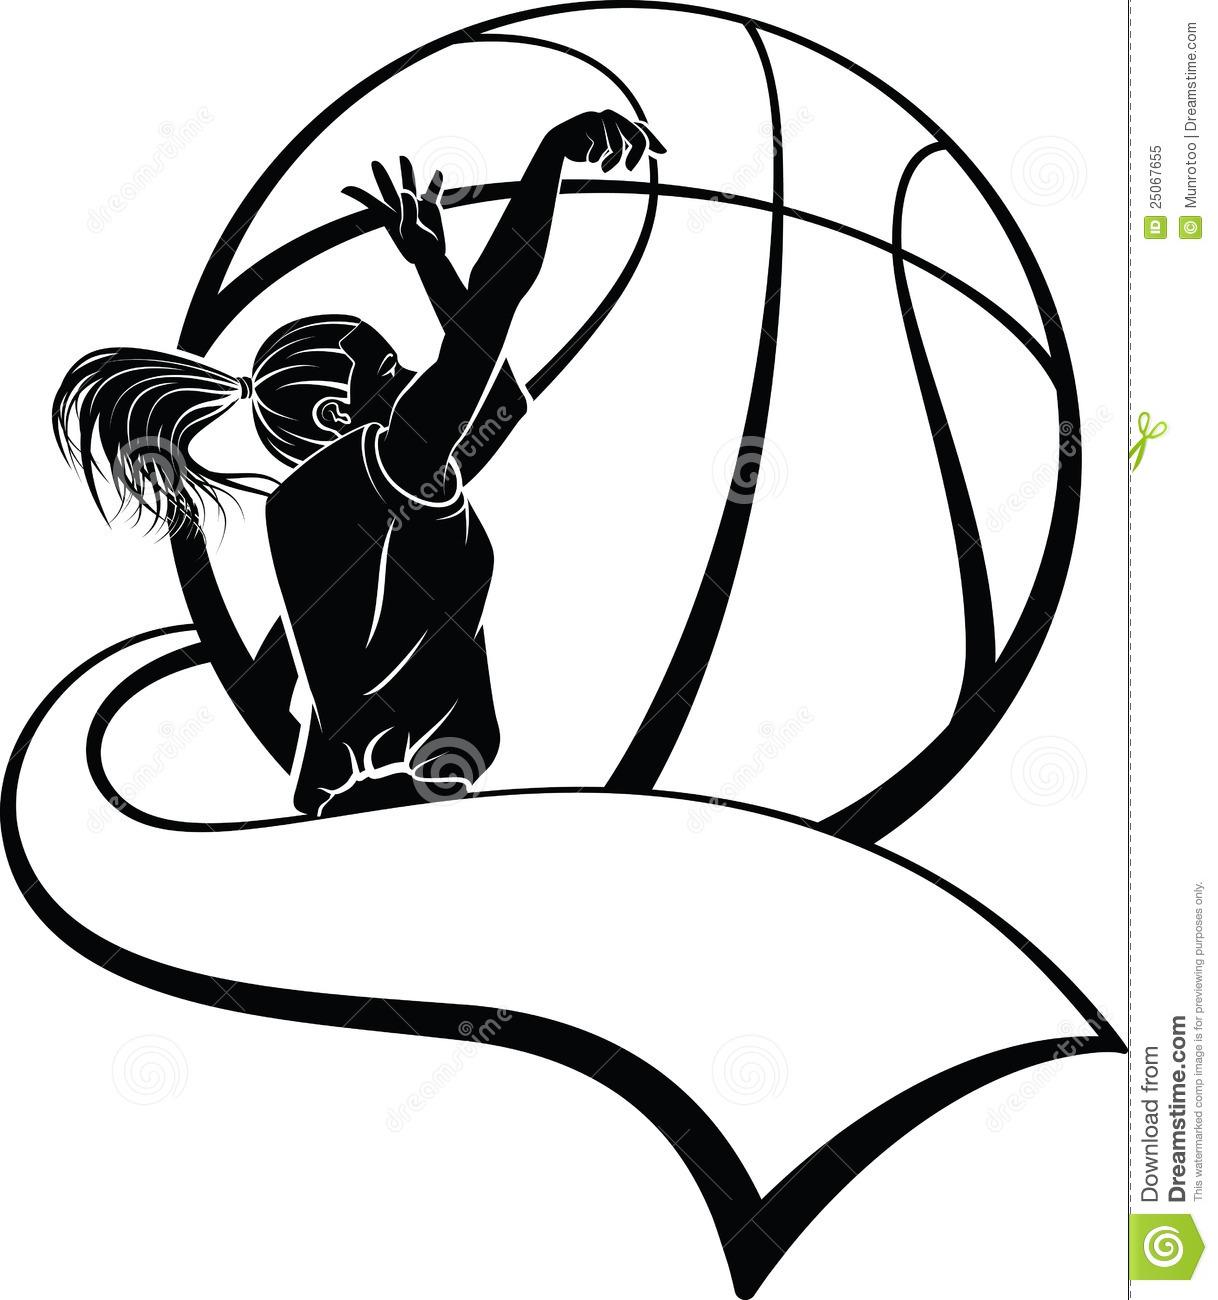 Girls Basketball Clipart #1 | Clipart Panda - Free Clipart